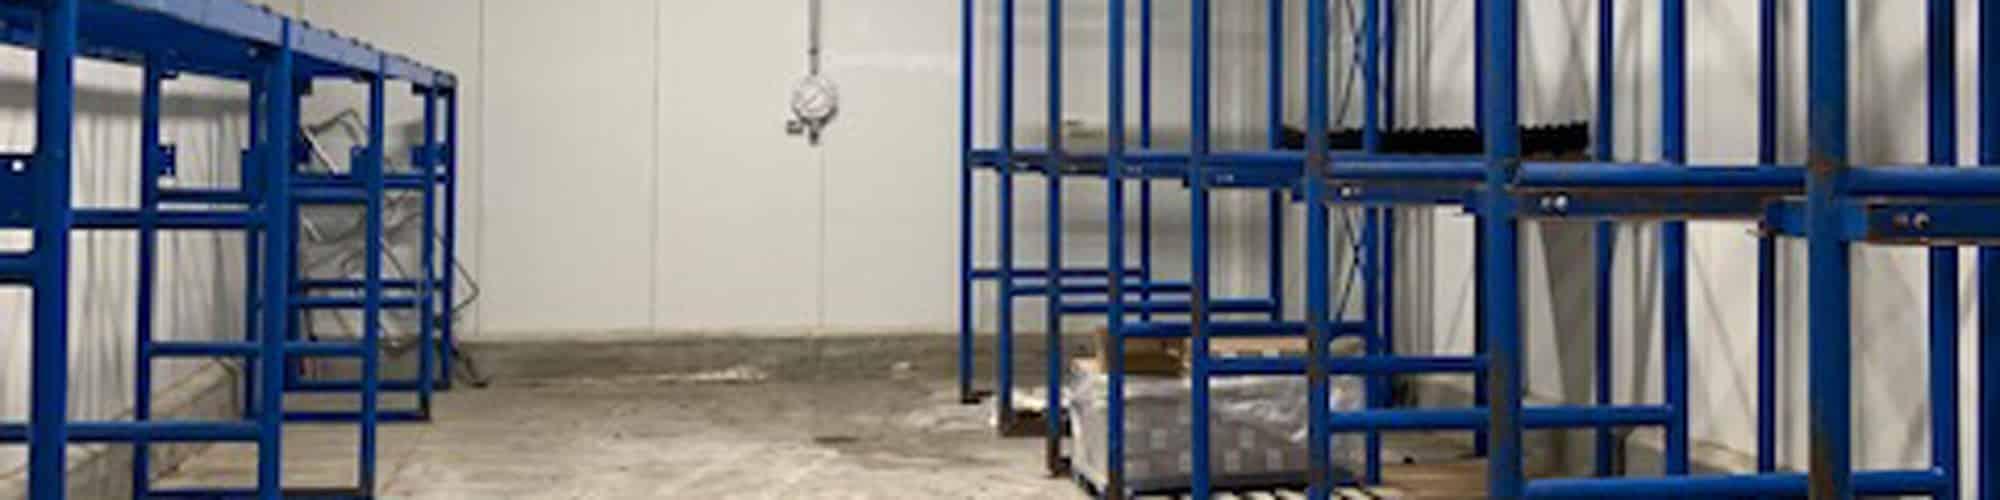 New Braunfels Food Processing & Cold Storage